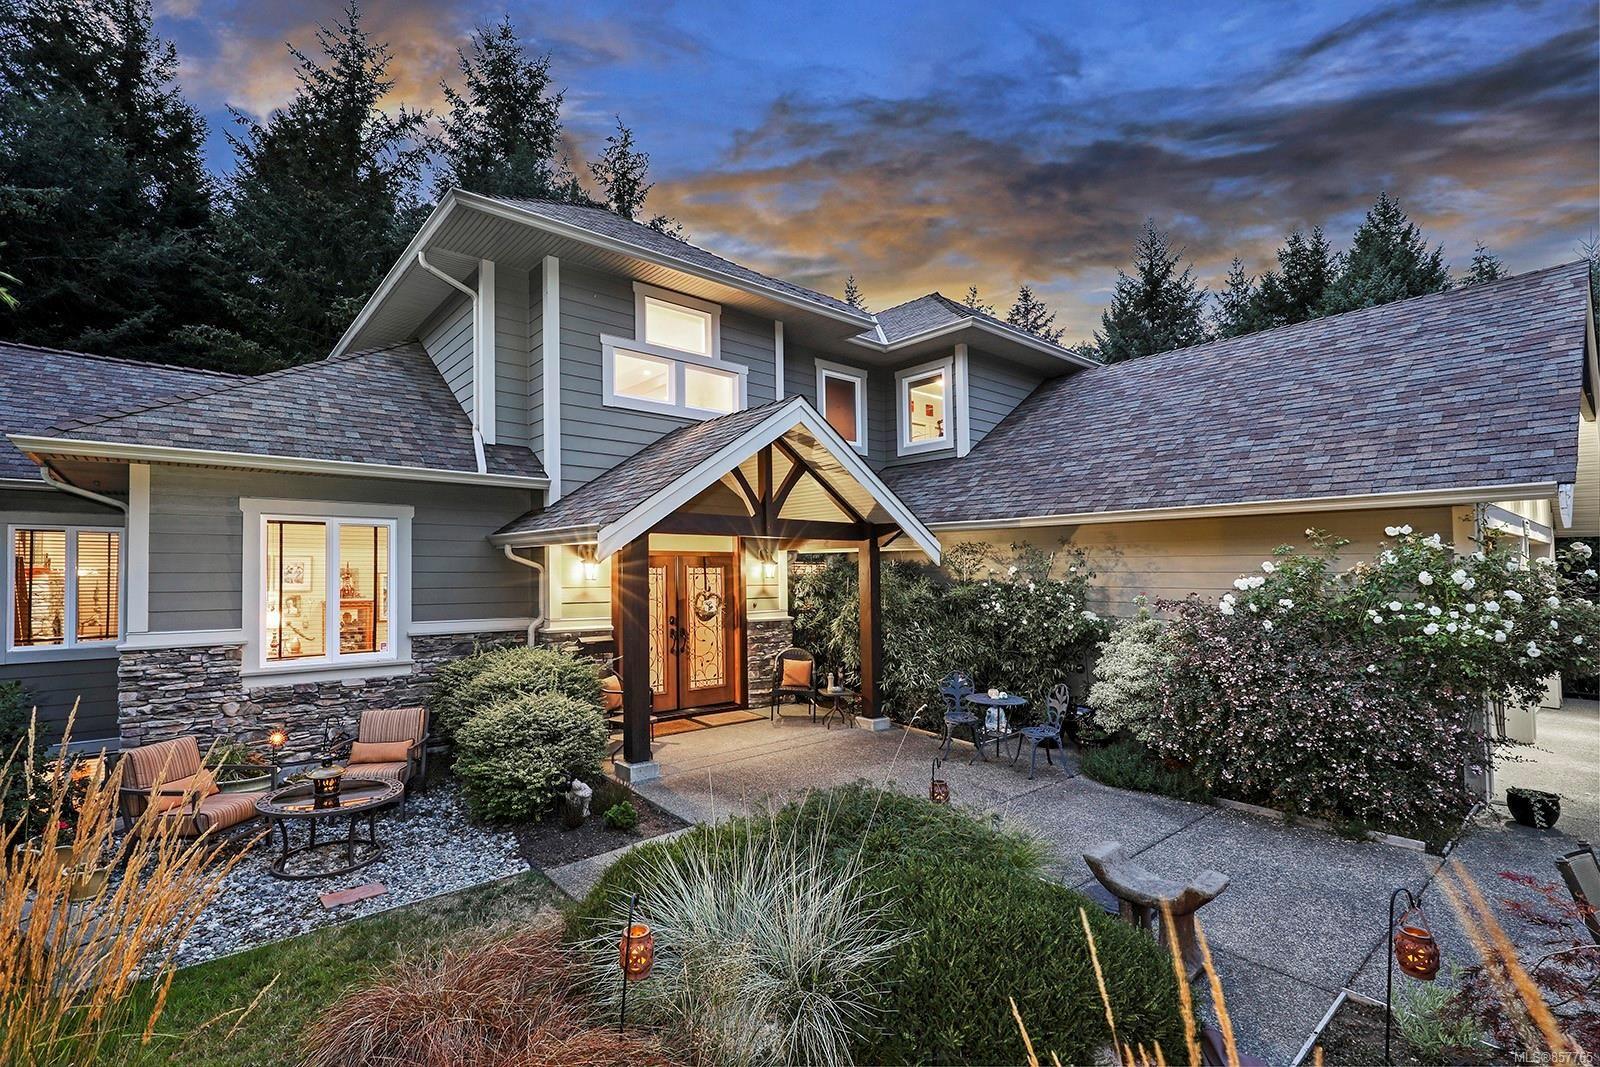 Photo 41: Photos: 1516 Highridge Dr in : CV Comox (Town of) House for sale (Comox Valley)  : MLS®# 857765